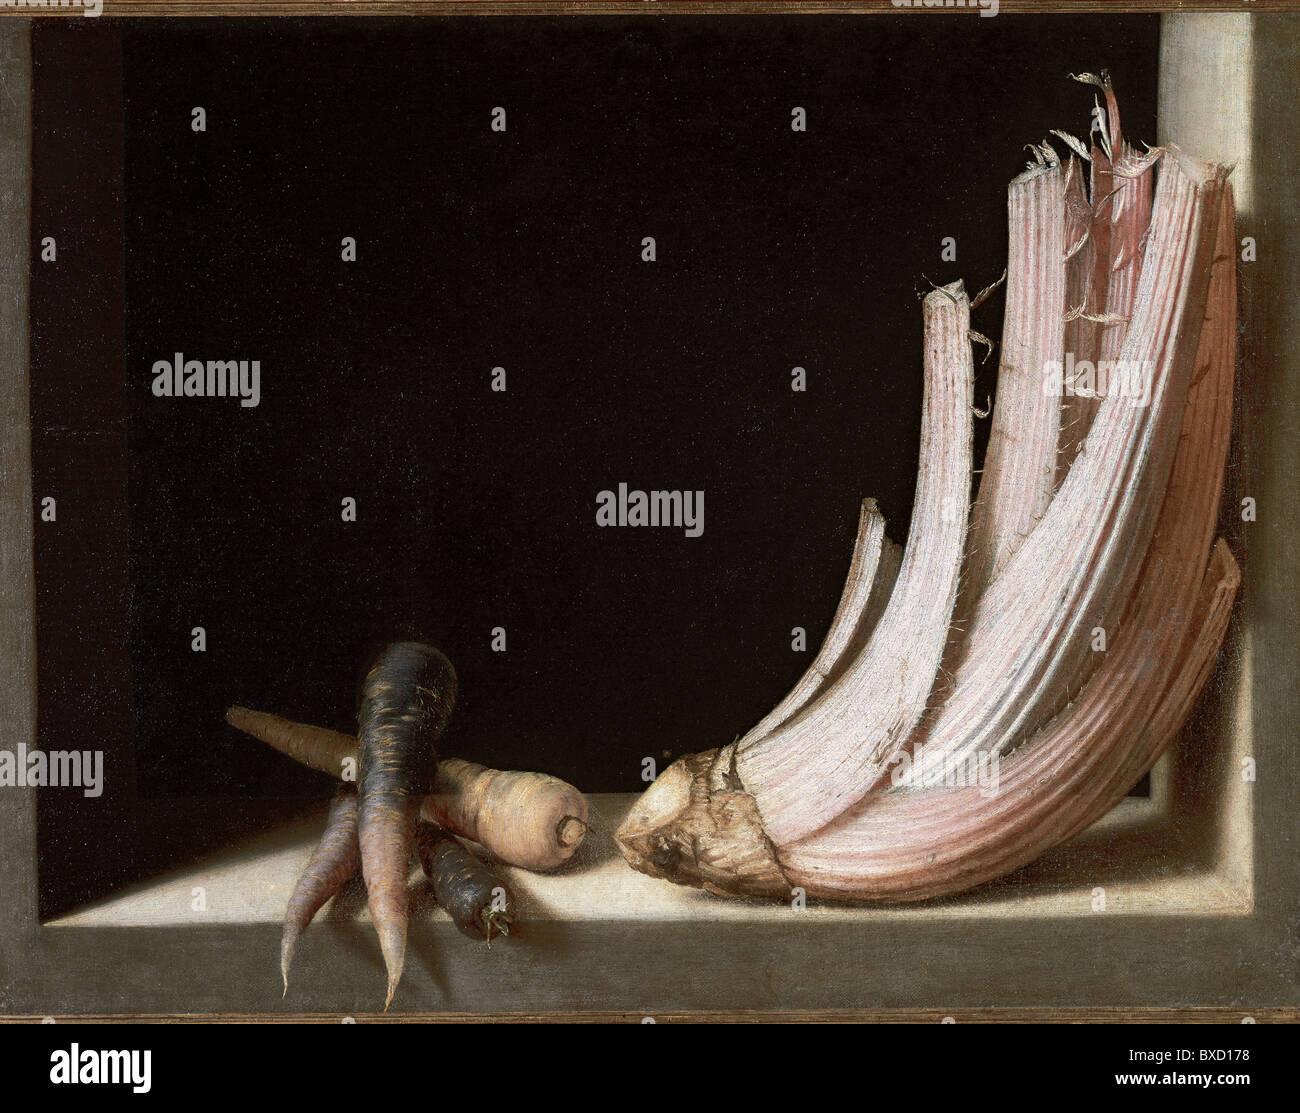 Friar Juan Sanchez Cotan (1560-1627). Spanish painter. Still Life with thistle and carrots. - Stock Image